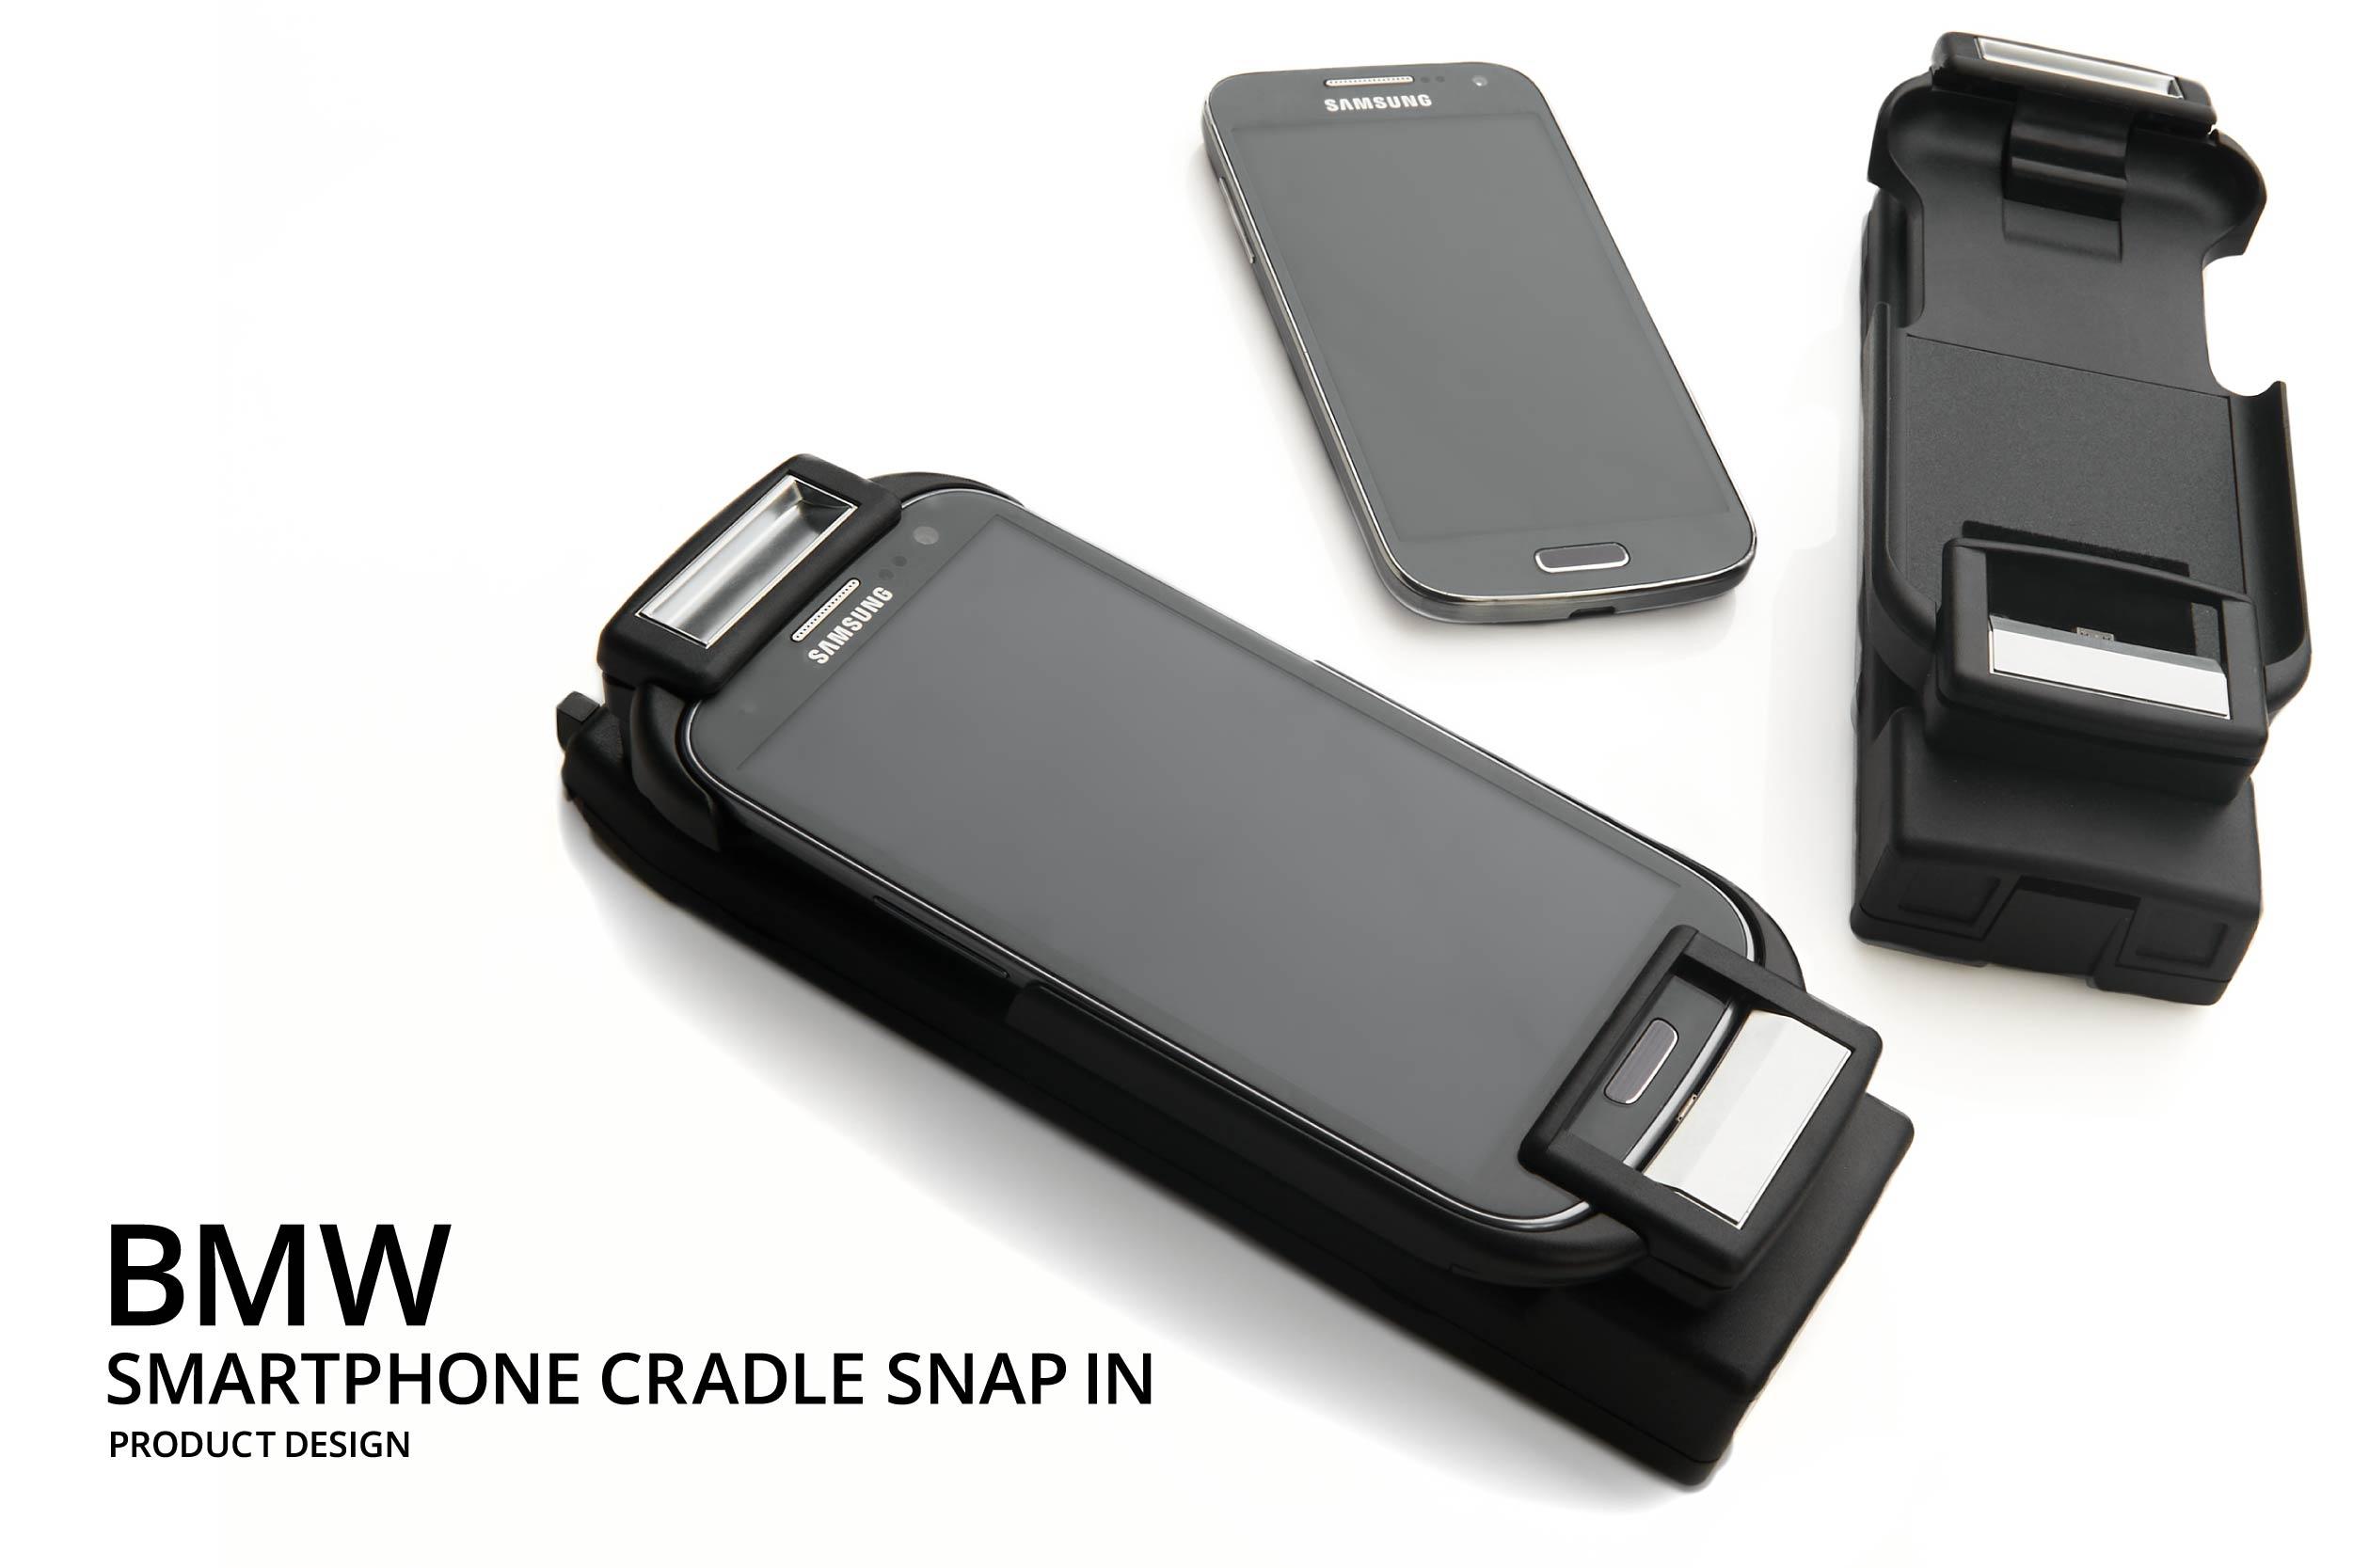 BMW-SMARTPHONE-CRADLE-SNAP-IN-1